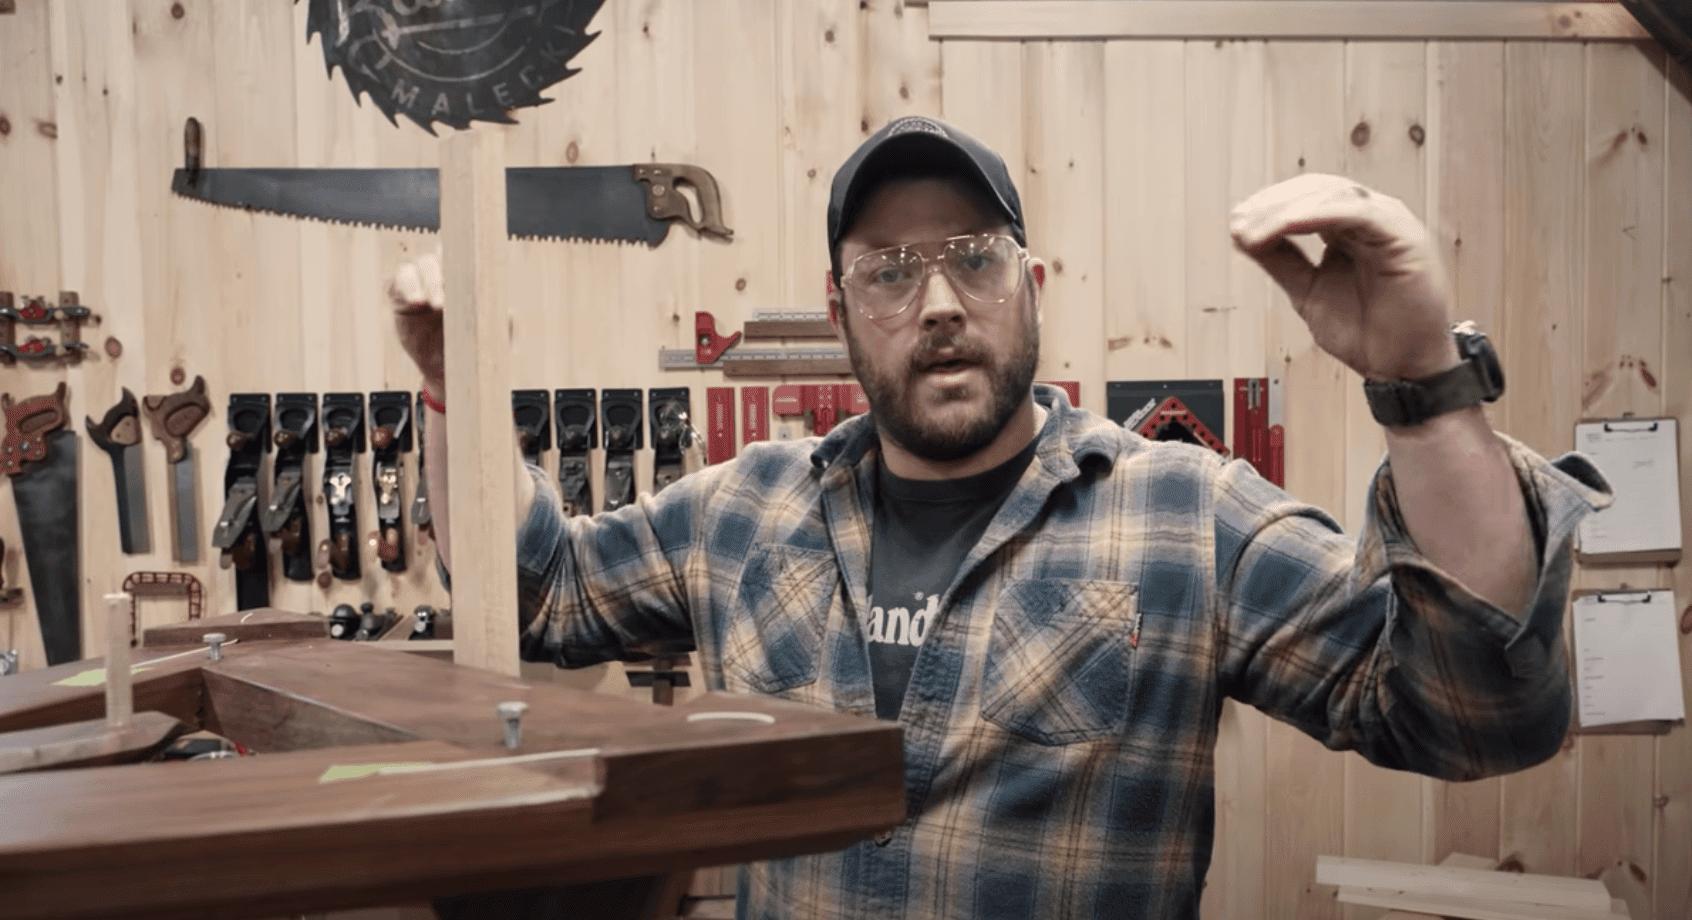 John Malecki with a saw